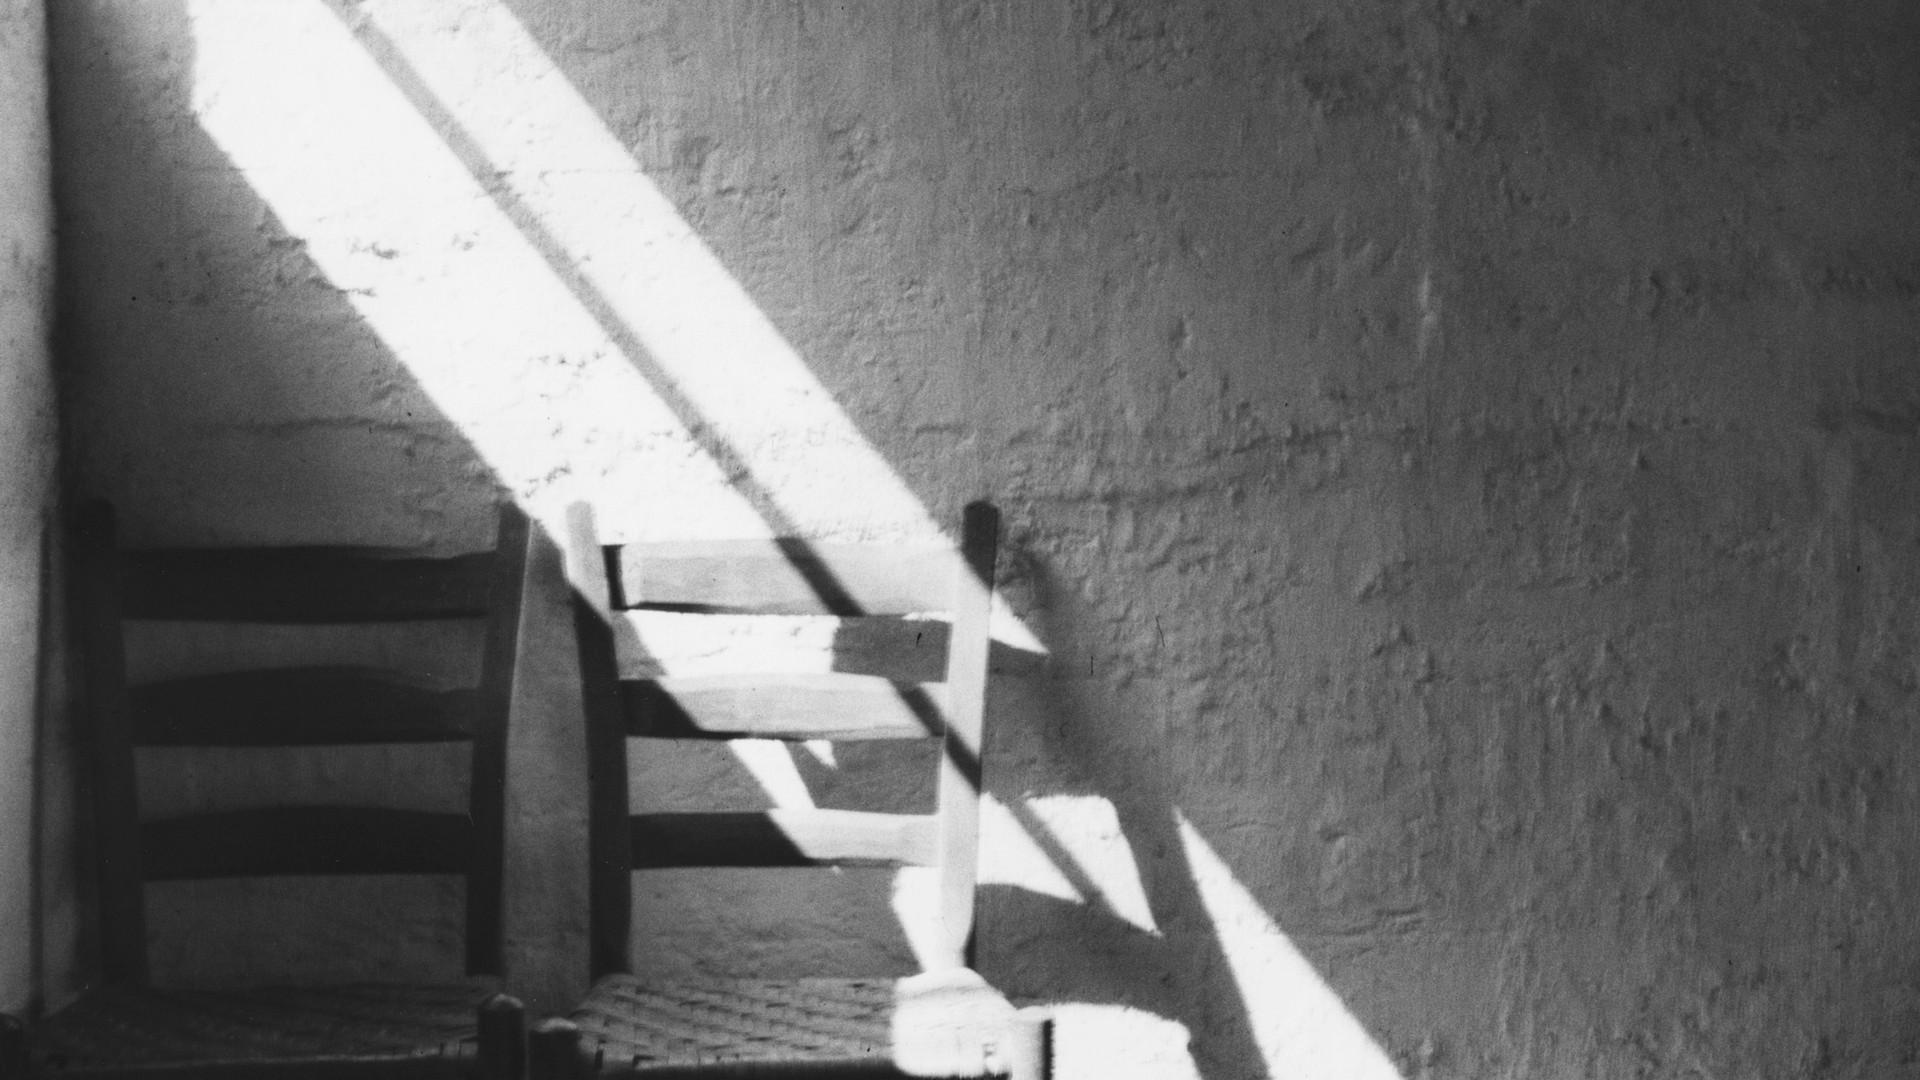 Robert Rauschenberg, Quiet House - Black Mountain, 1949